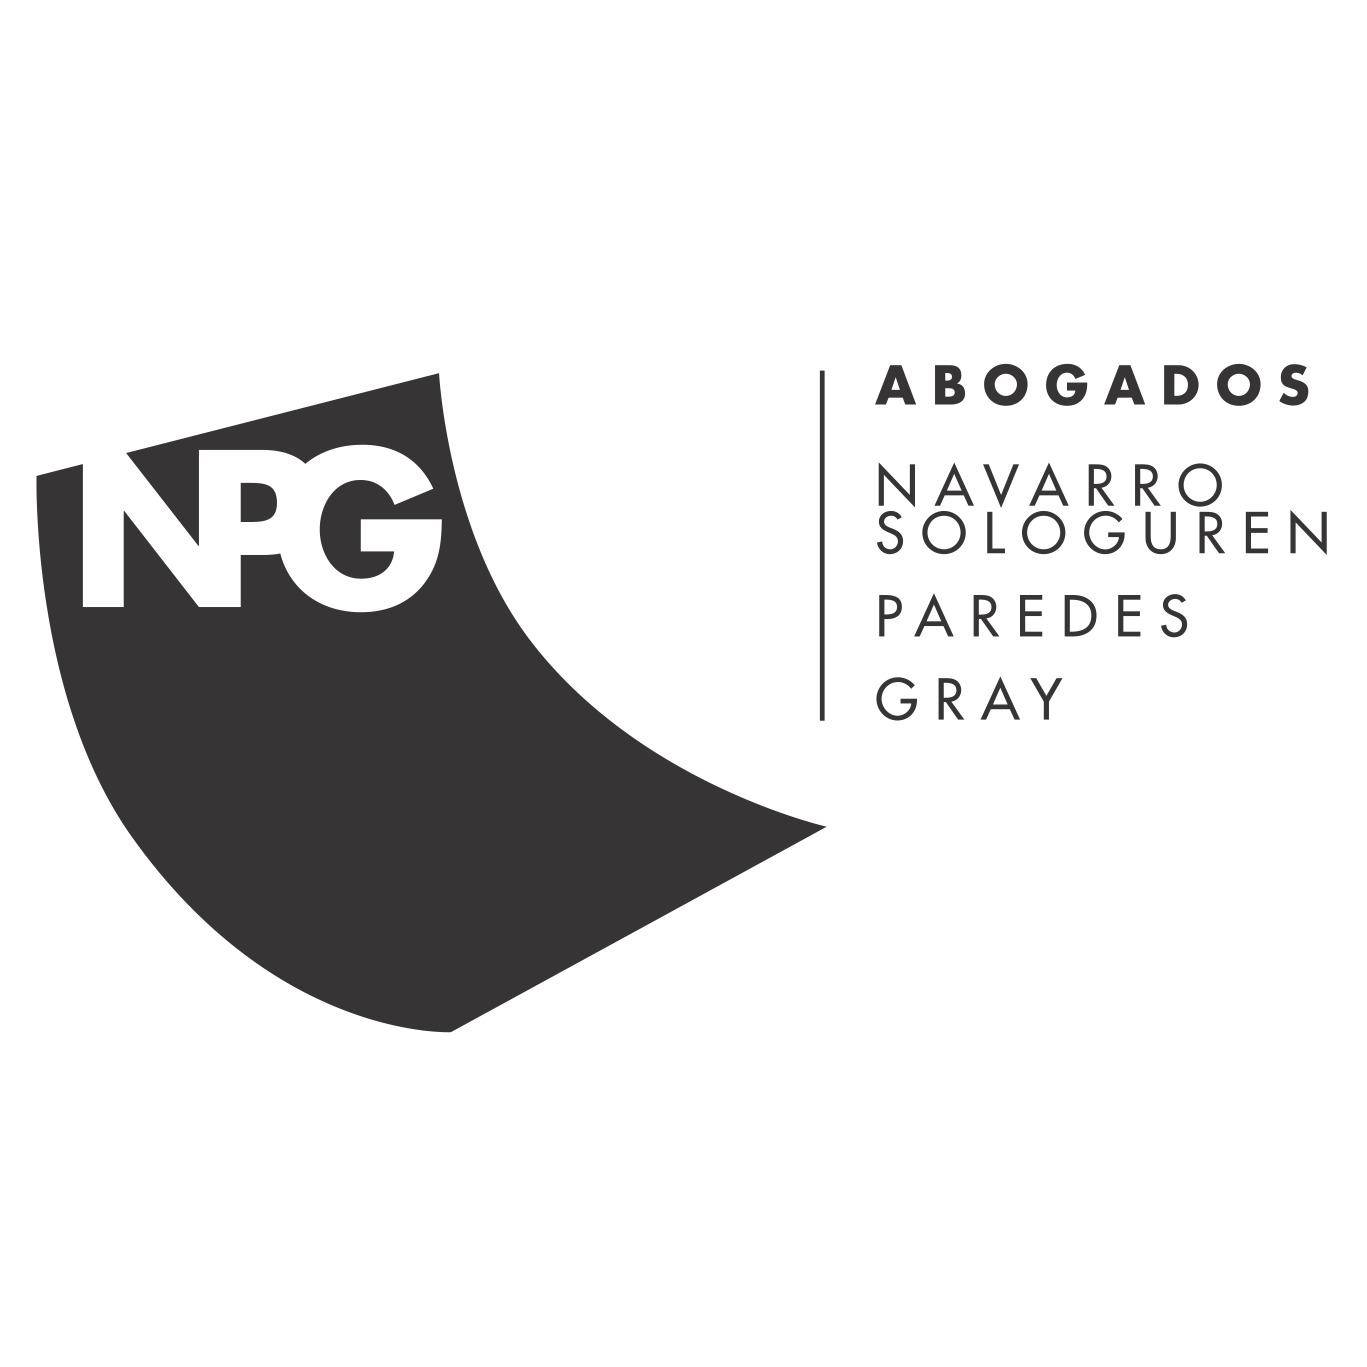 the Navarro Sologurren Paredes Gray logo.